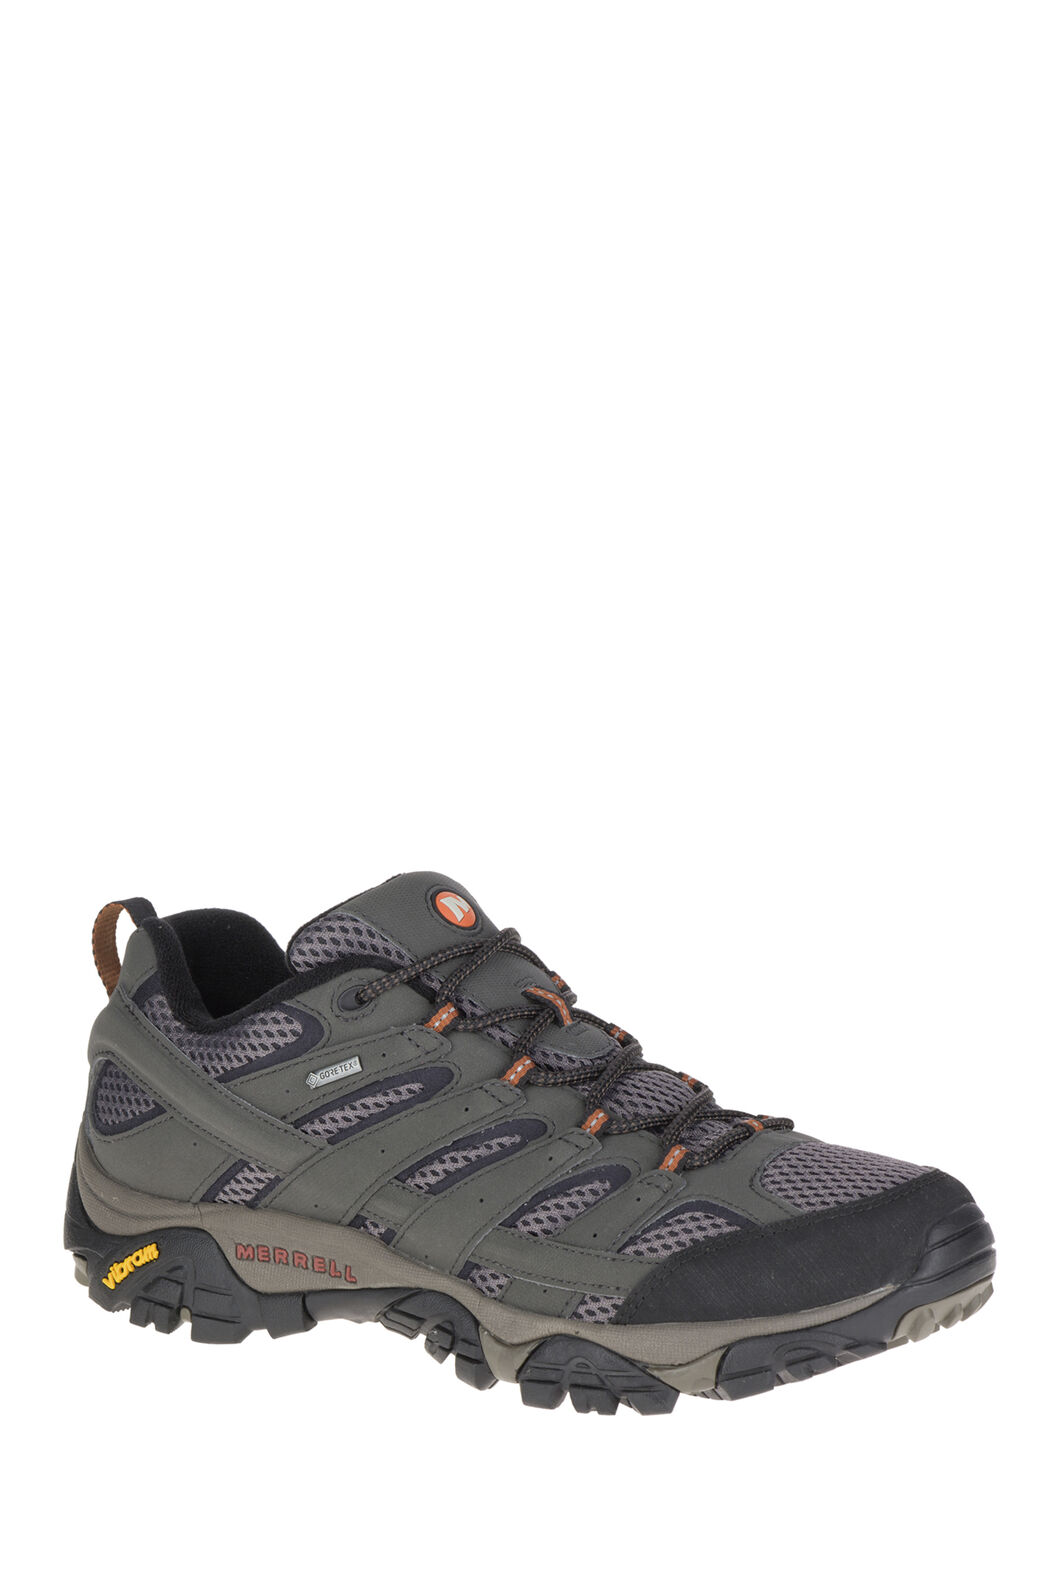 Merrell Moab 2 GTX Hiking Shoes — Men's, Beluga, hi-res